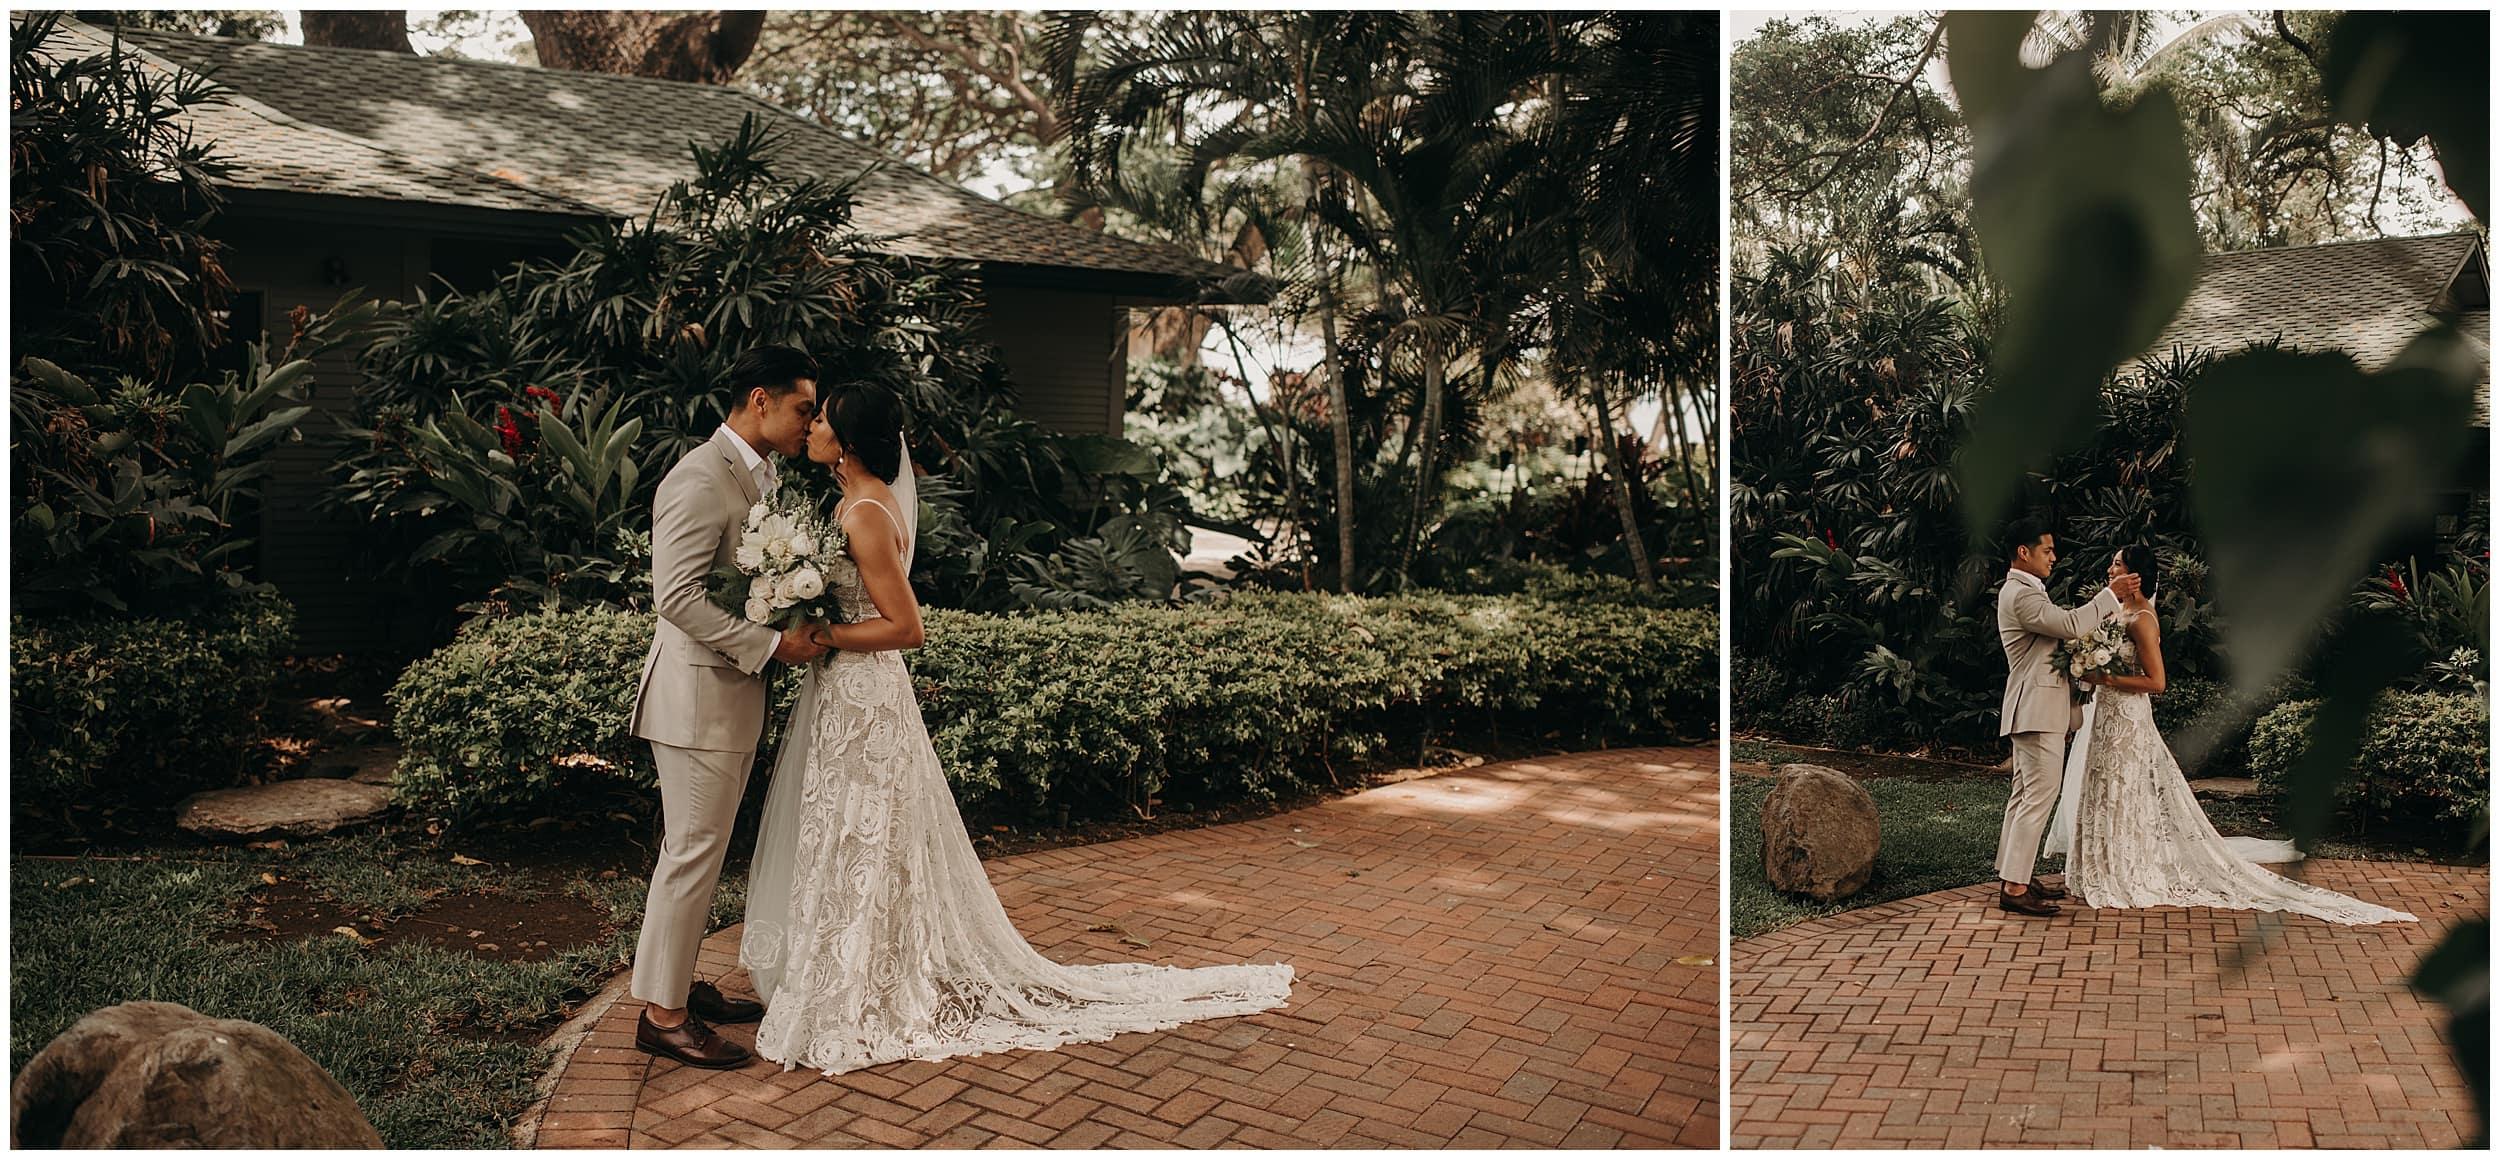 Maui wedding photography-10-11_0019